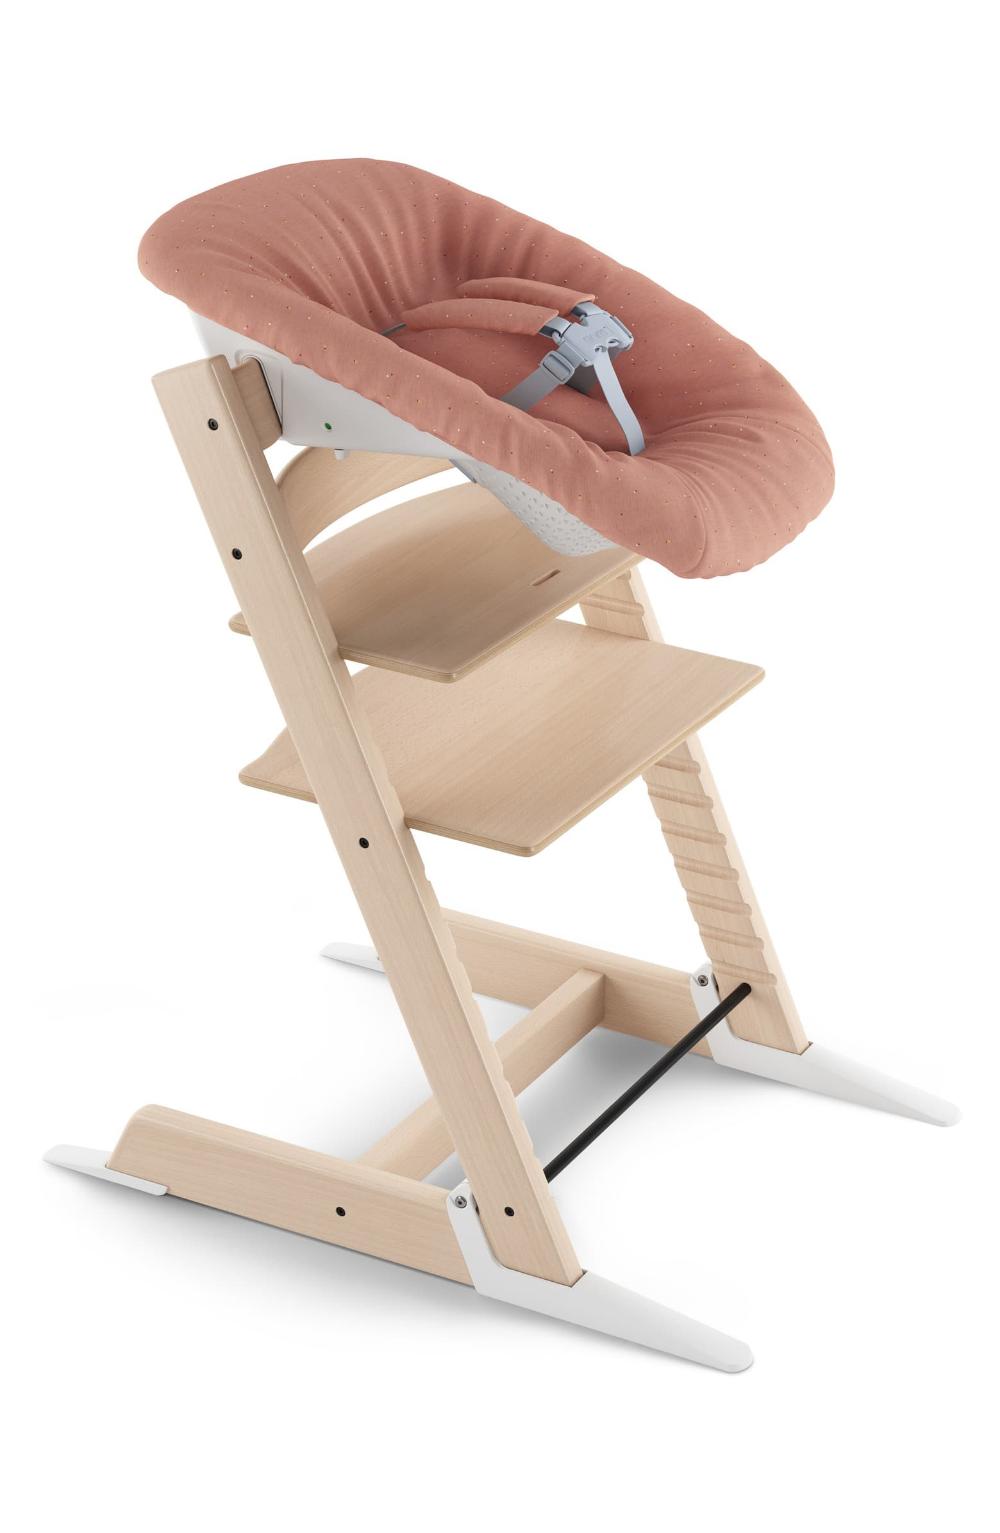 Stokke Tripp Trapp Newborn Set Nordstrom Stokke Tripp Trapp Newborn Newborn Seat Best High Chairs